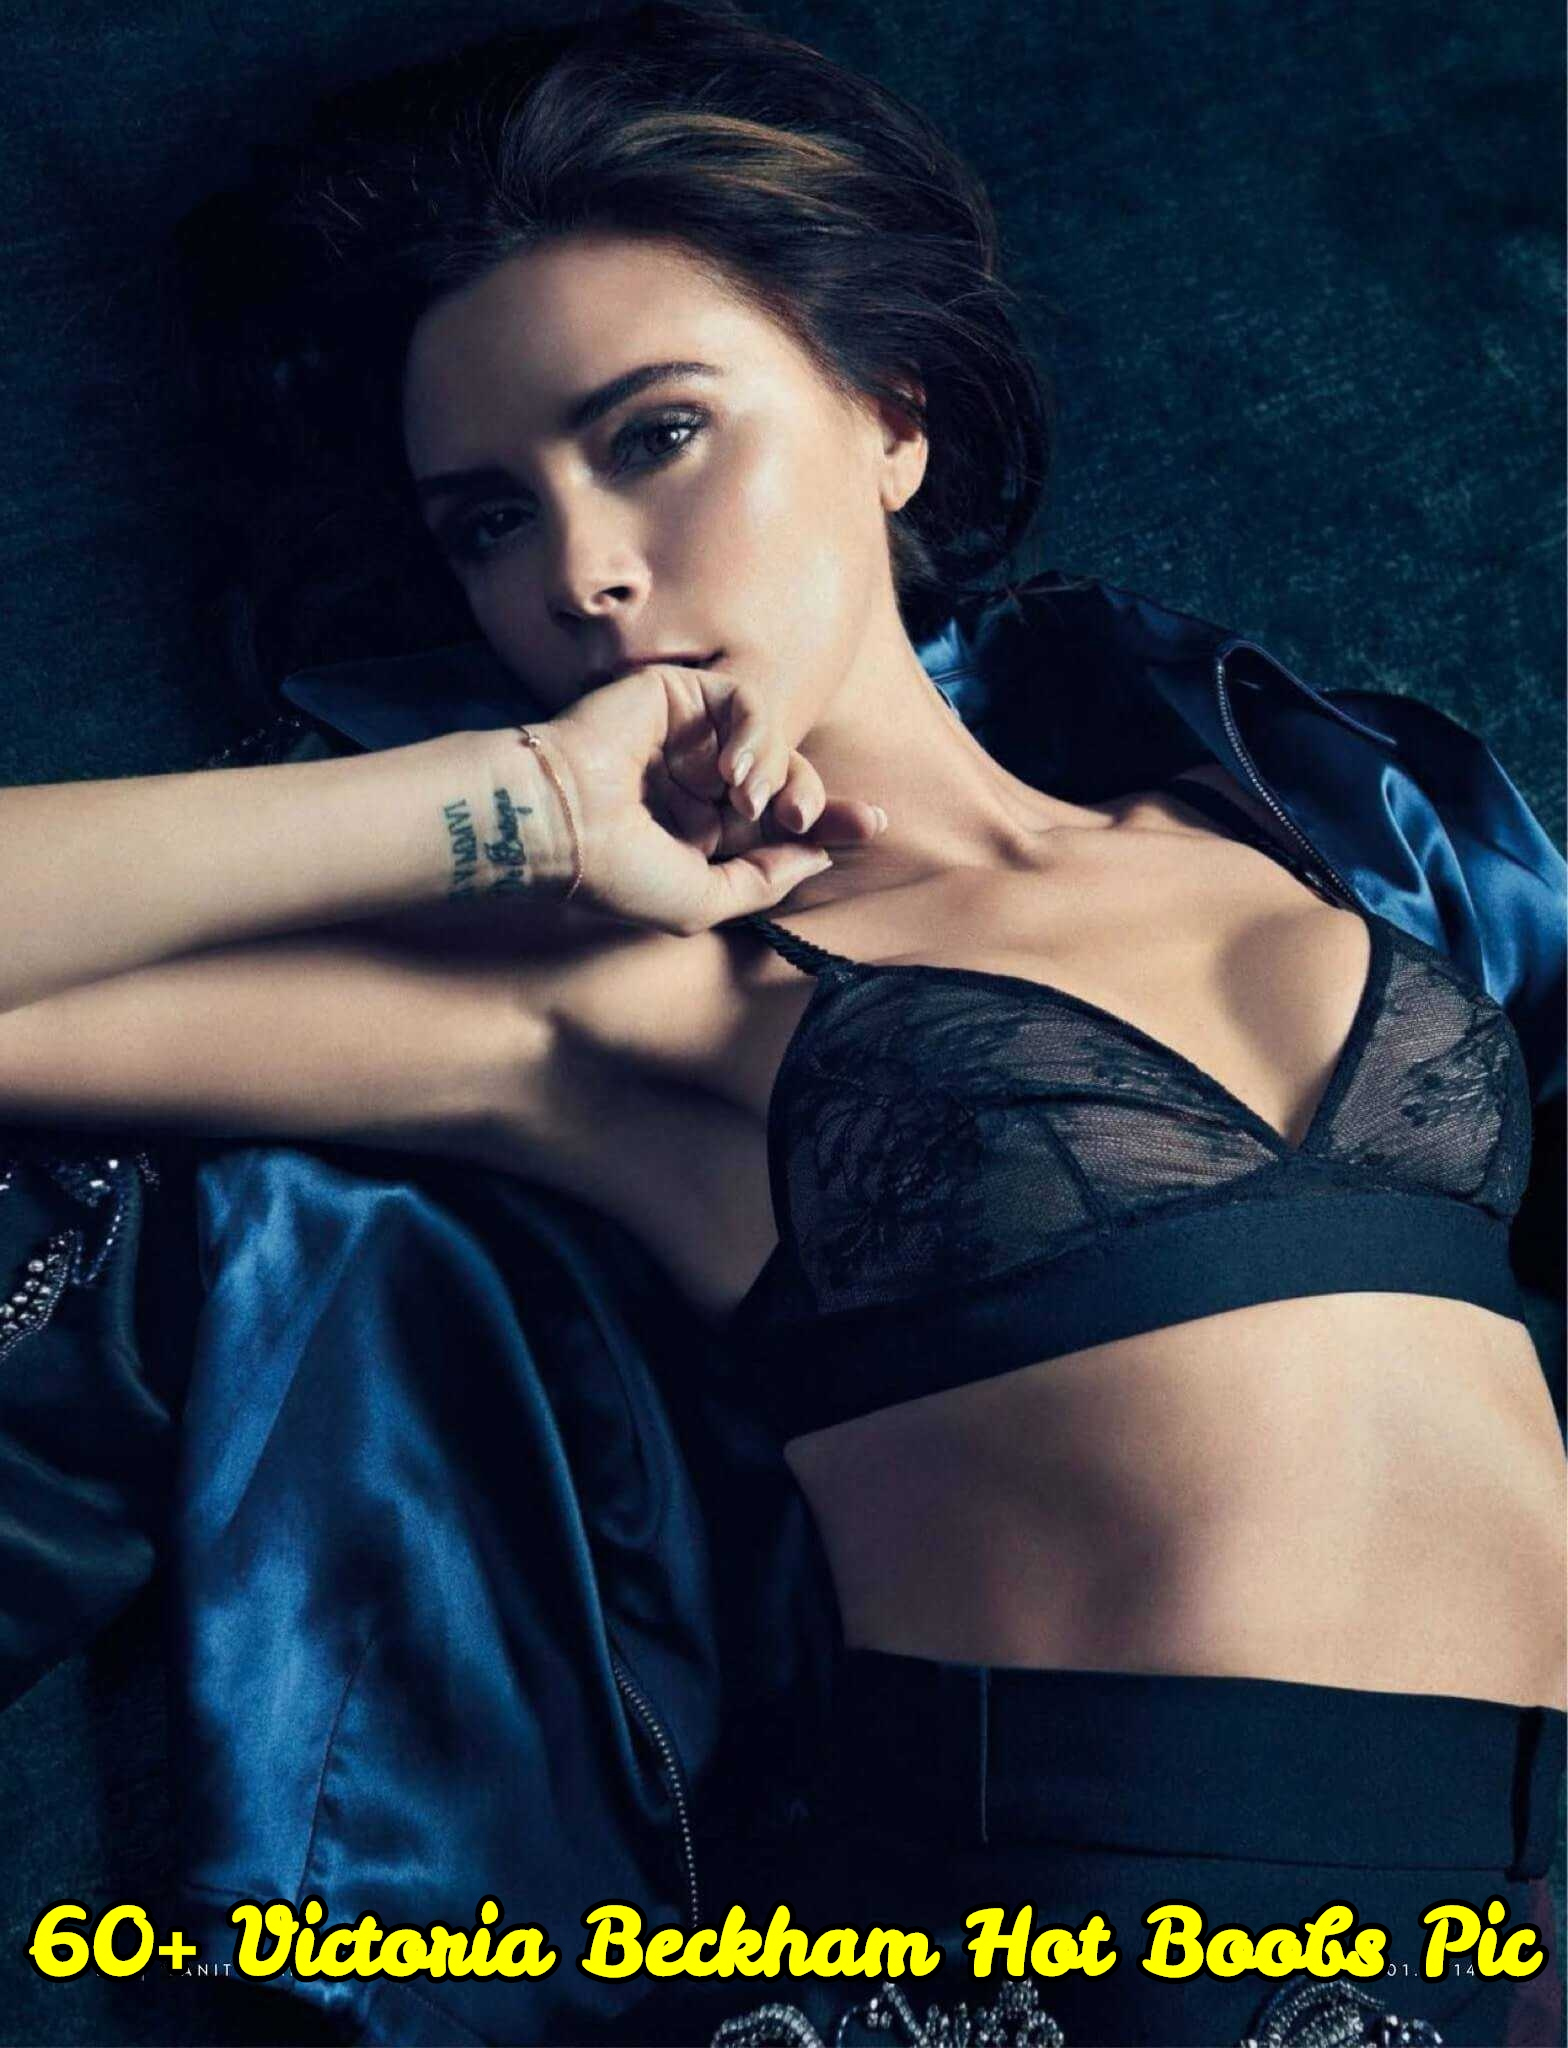 Victoria Beckham hot boobs pic